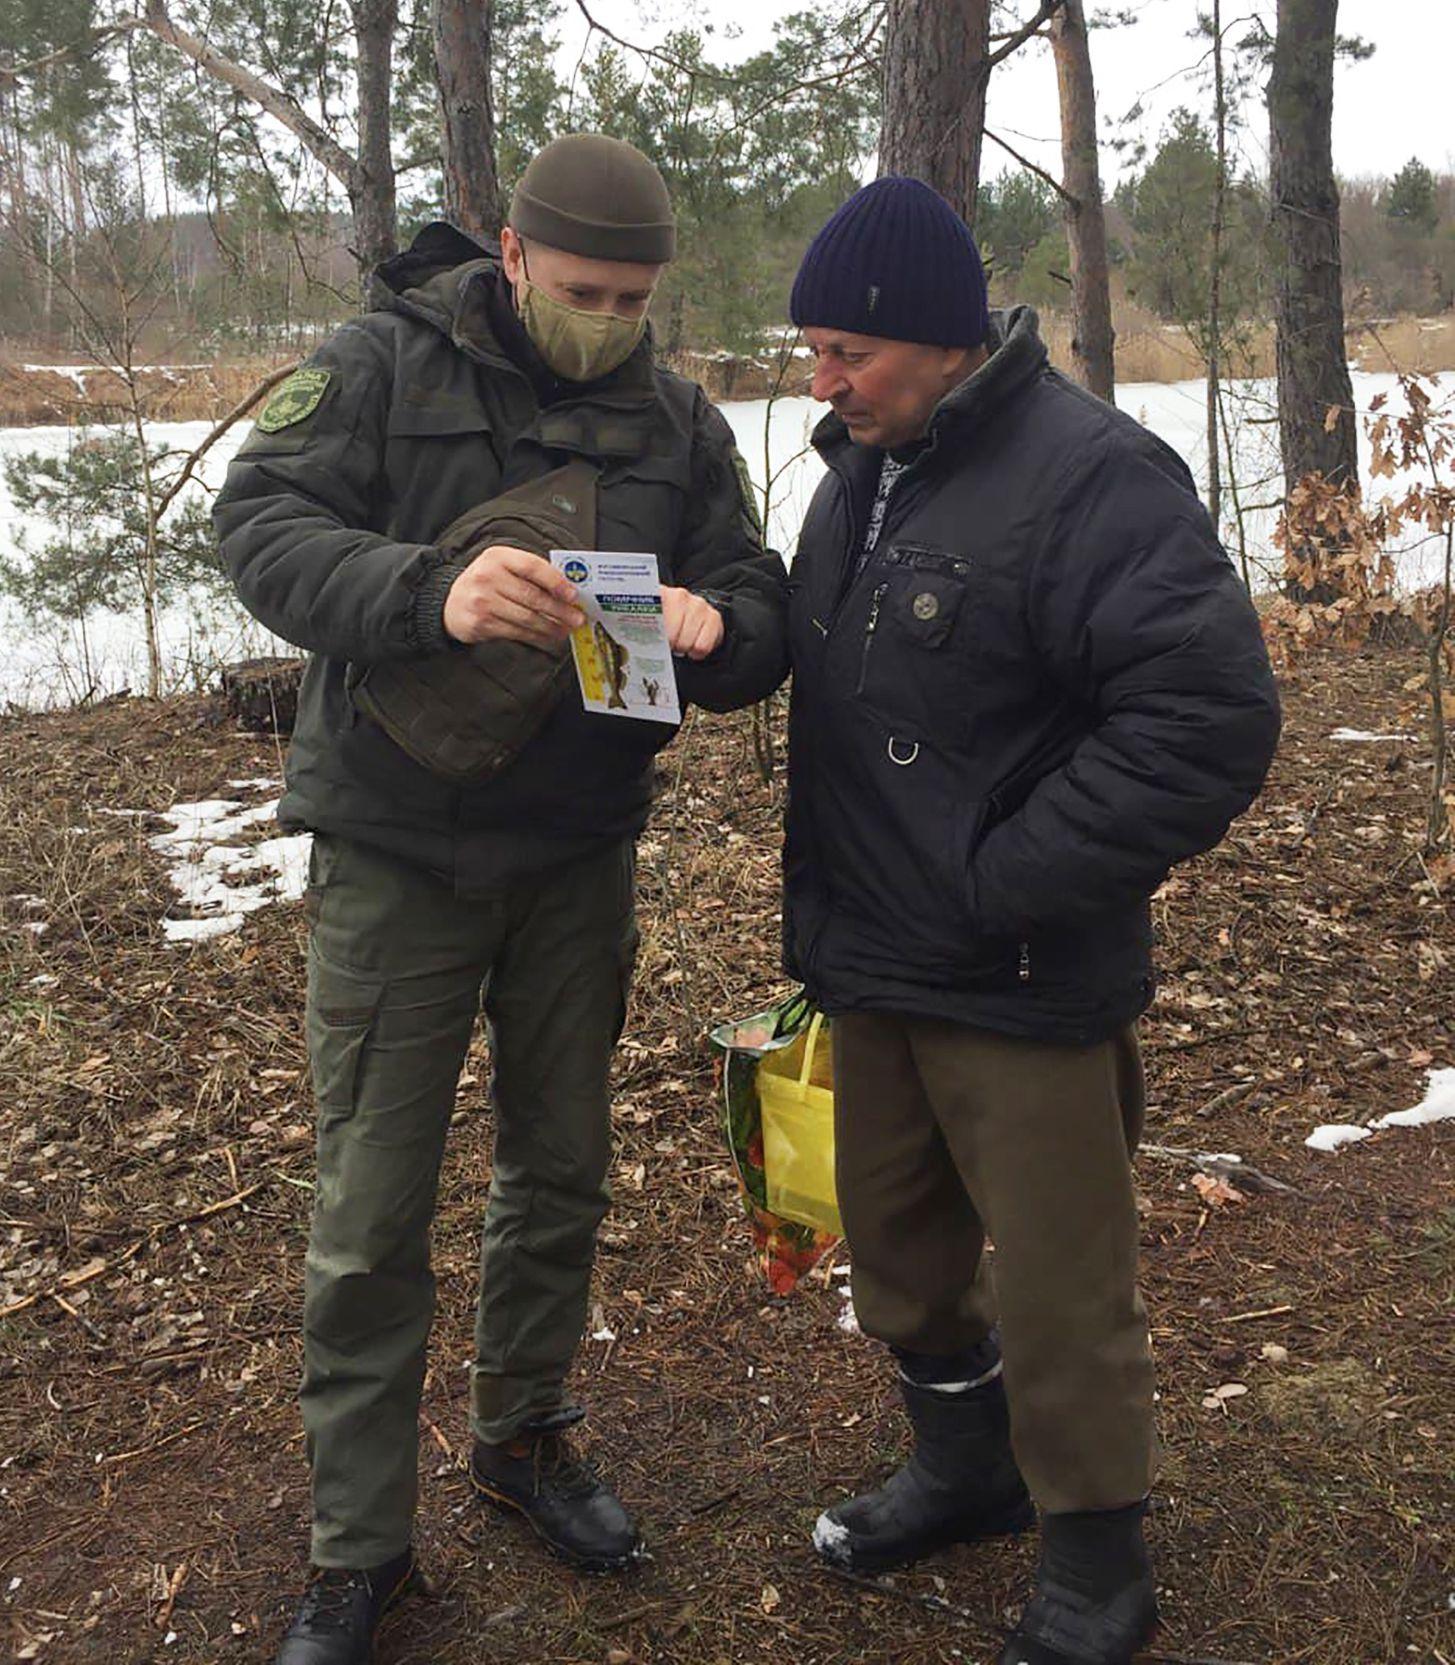 Житомирщина: На риболовлю — з буклетом